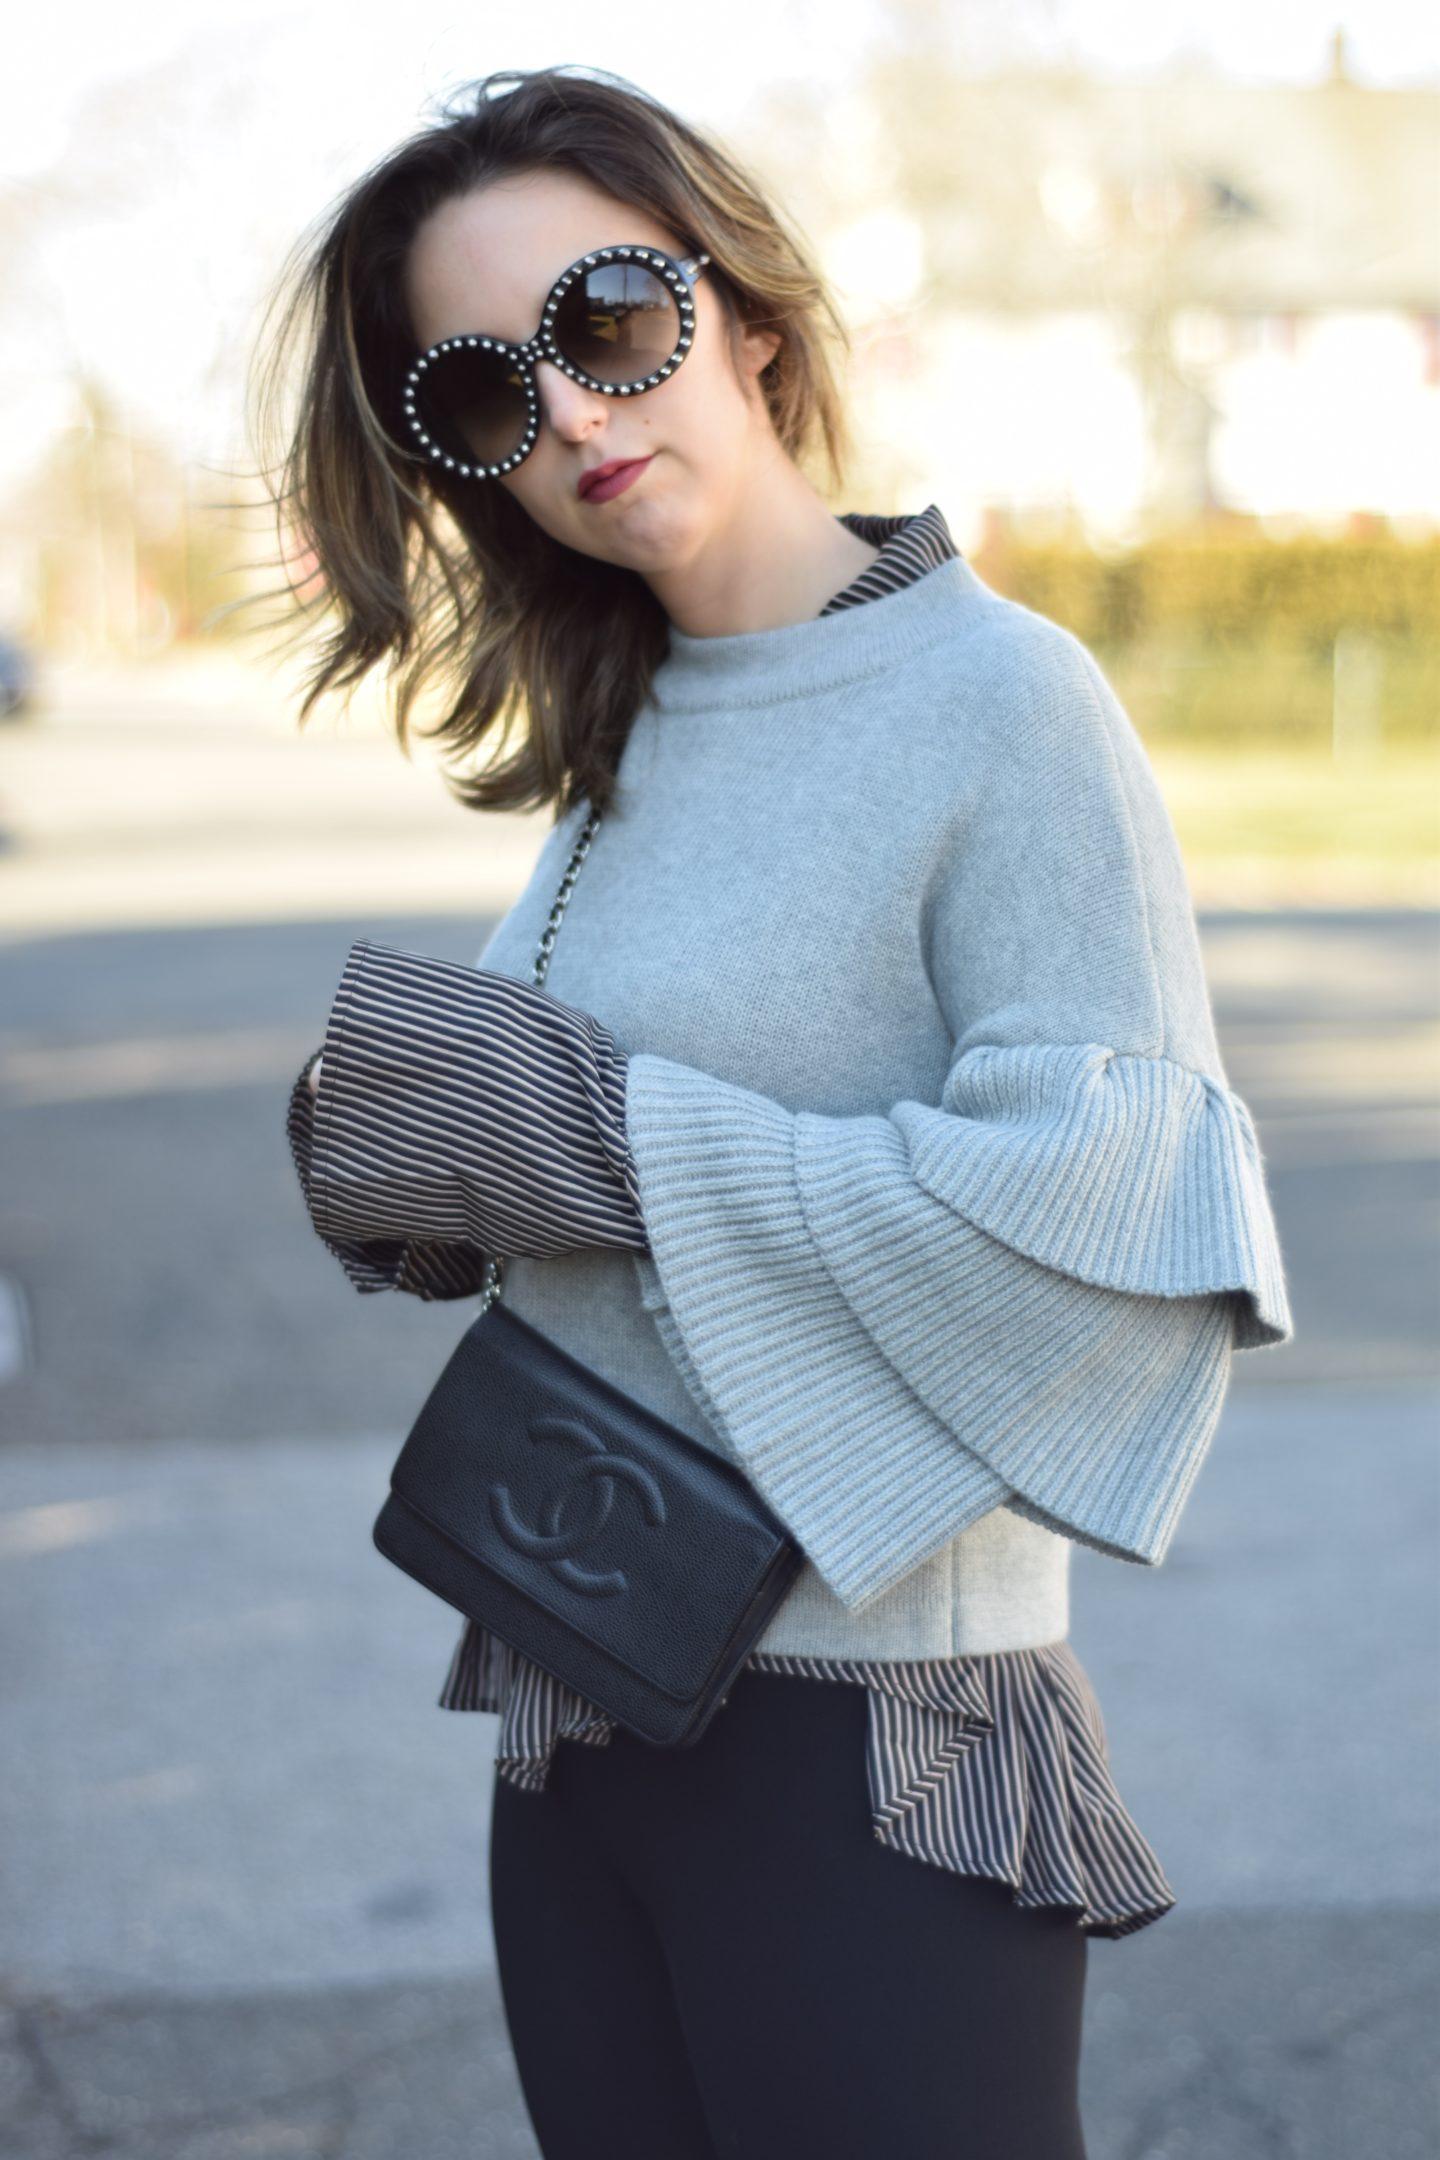 prada-stud-sunglasses-blogger-simply-by-simone